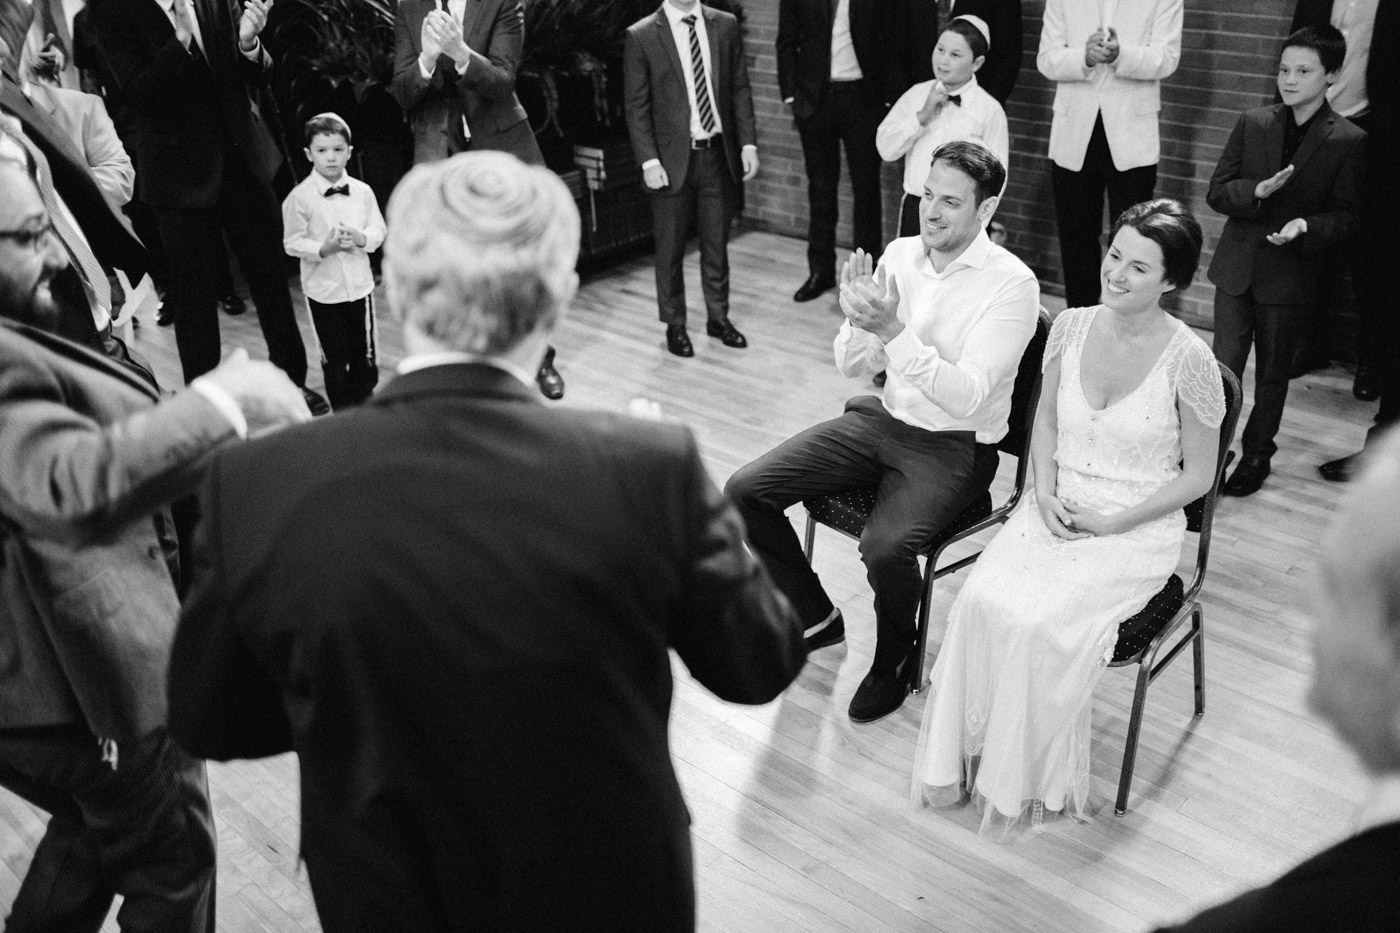 toronto_wedding_photographer_the_great_hall-69.jpg